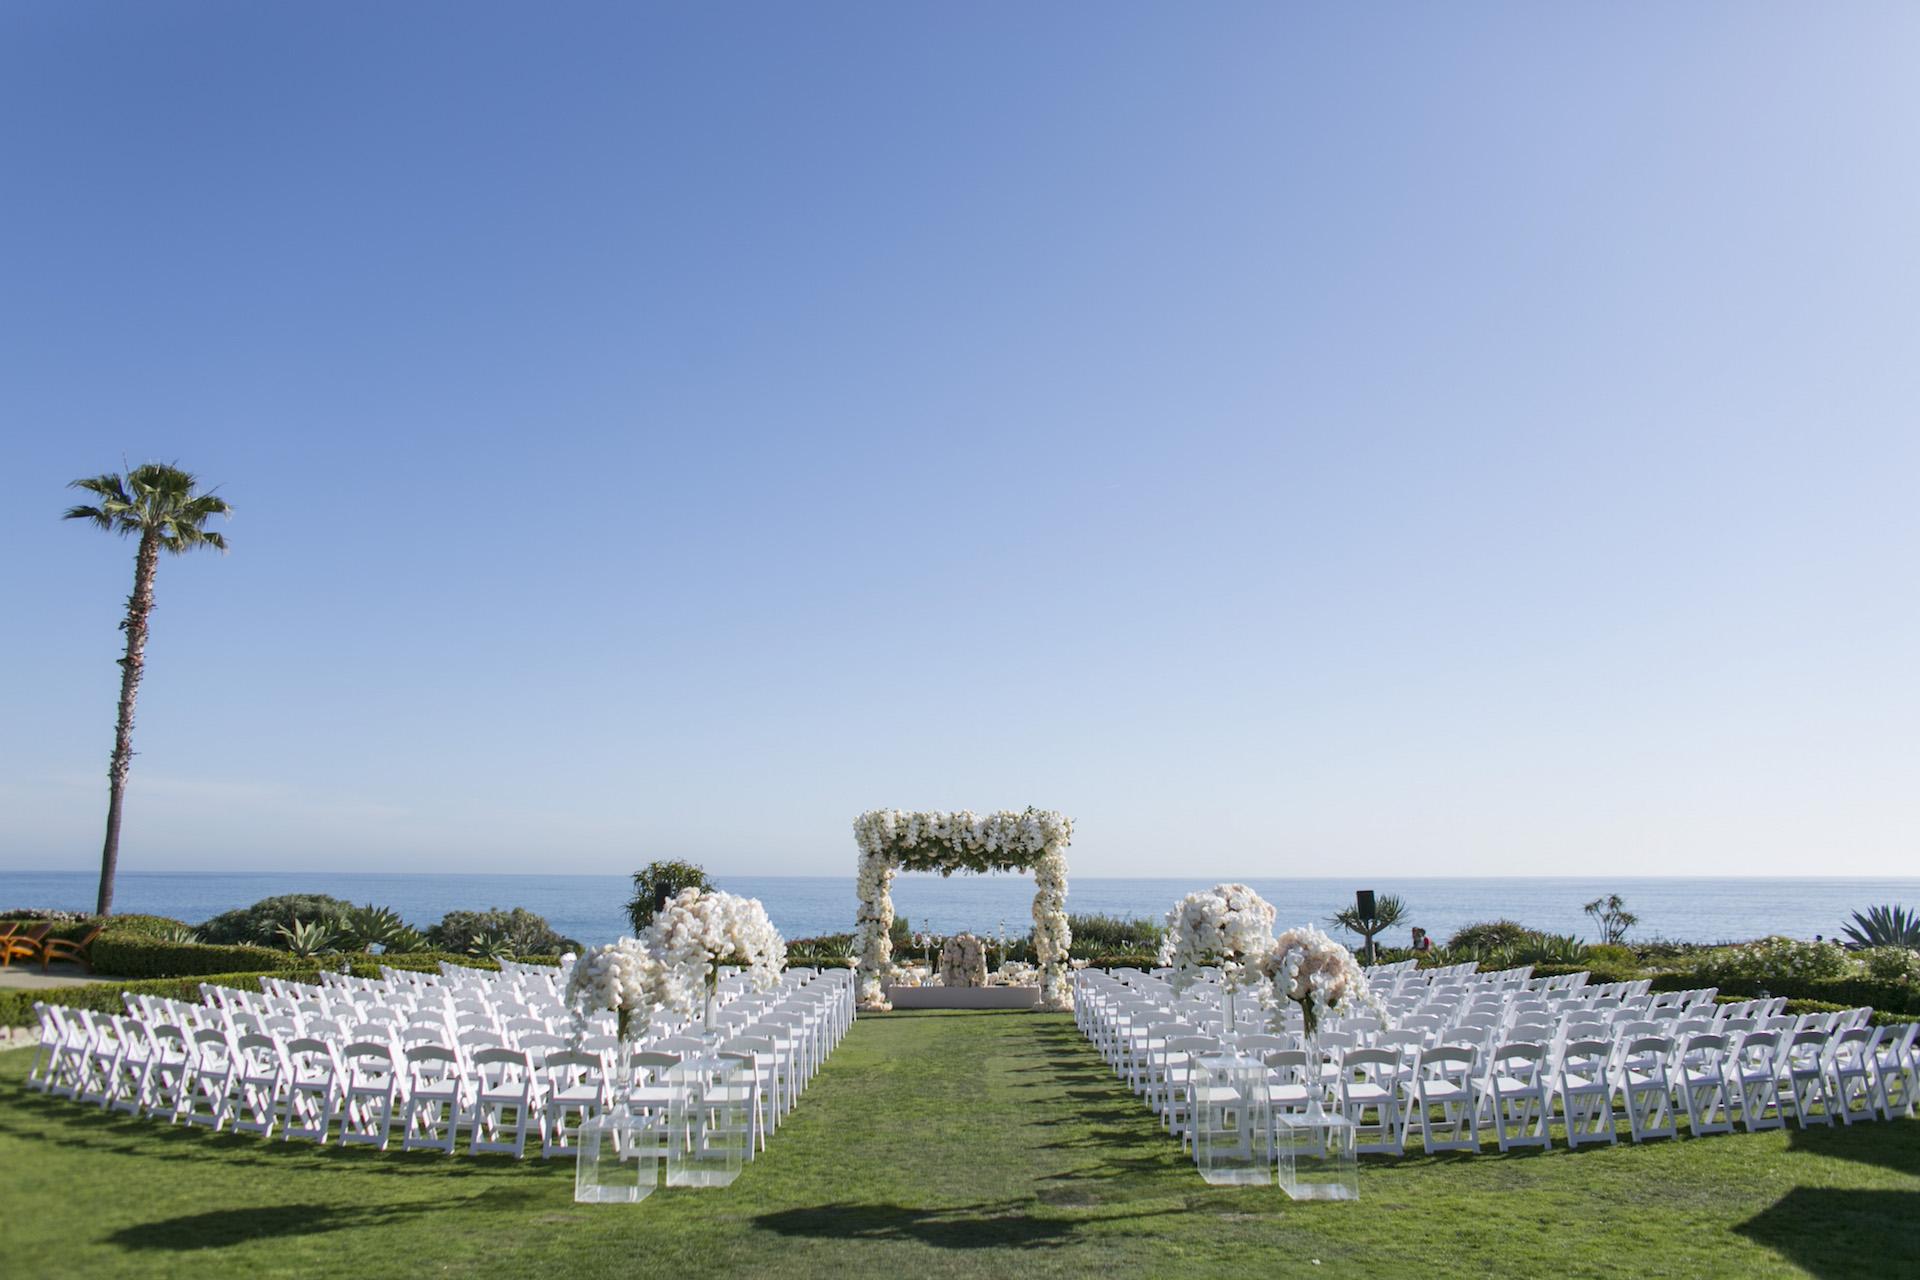 california beach wedding image gallery montage laguna beach 042015 drone name 04204095r deutz